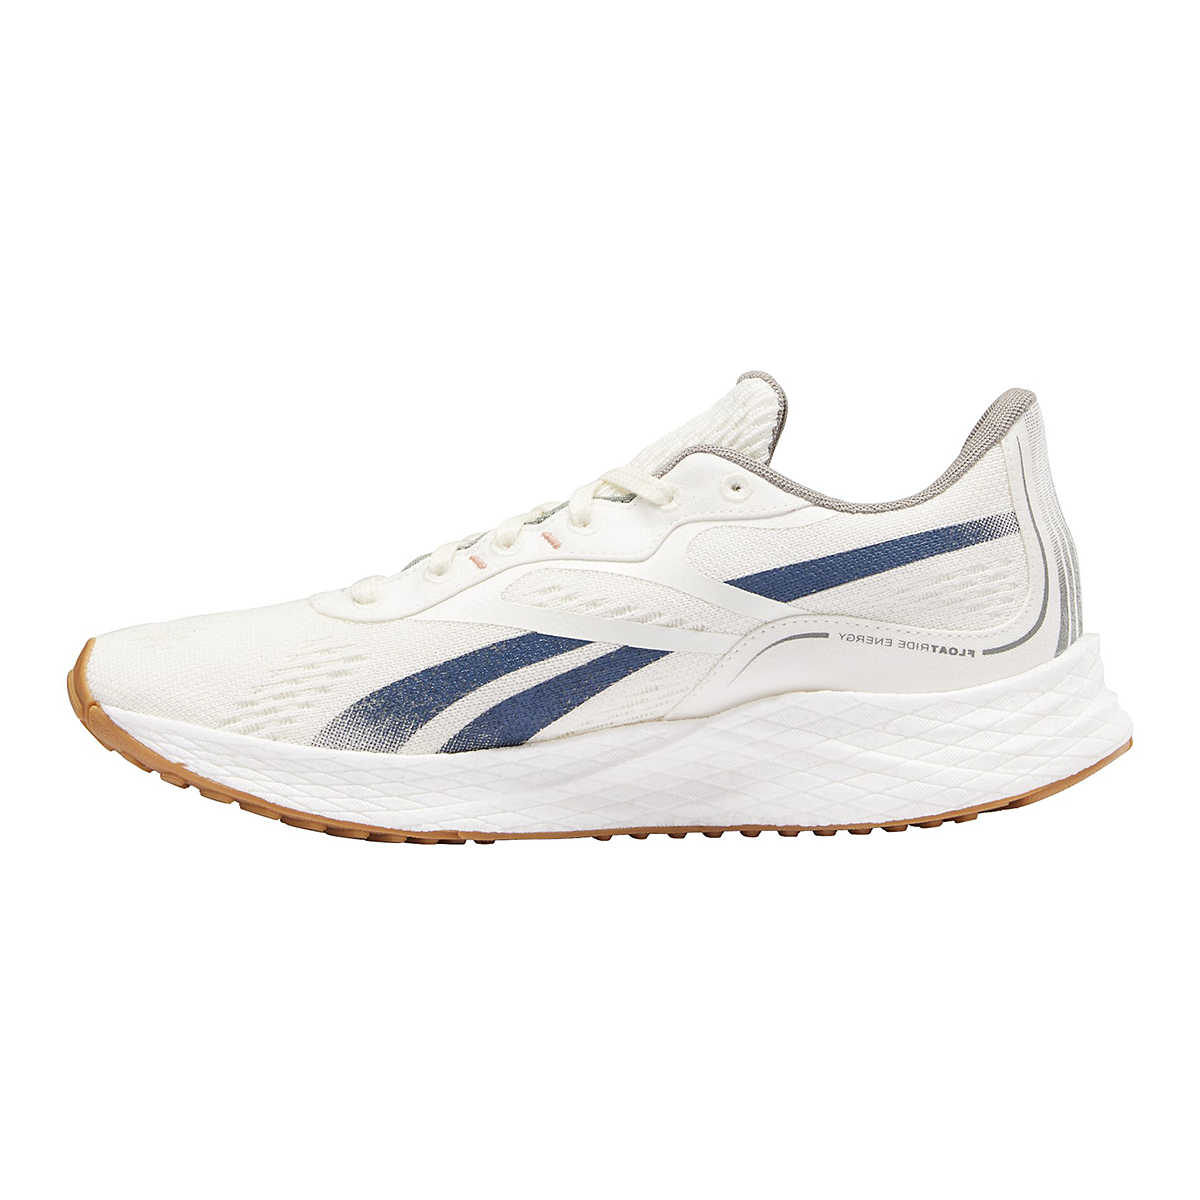 Men's Reebok Floatride Energy Grow Running Shoe - Color: Classic White/Brave Blue/Boulder Grey - Size: 7 - Width: Regular, Classic White/Brave Blue/Boulder Grey, large, image 2